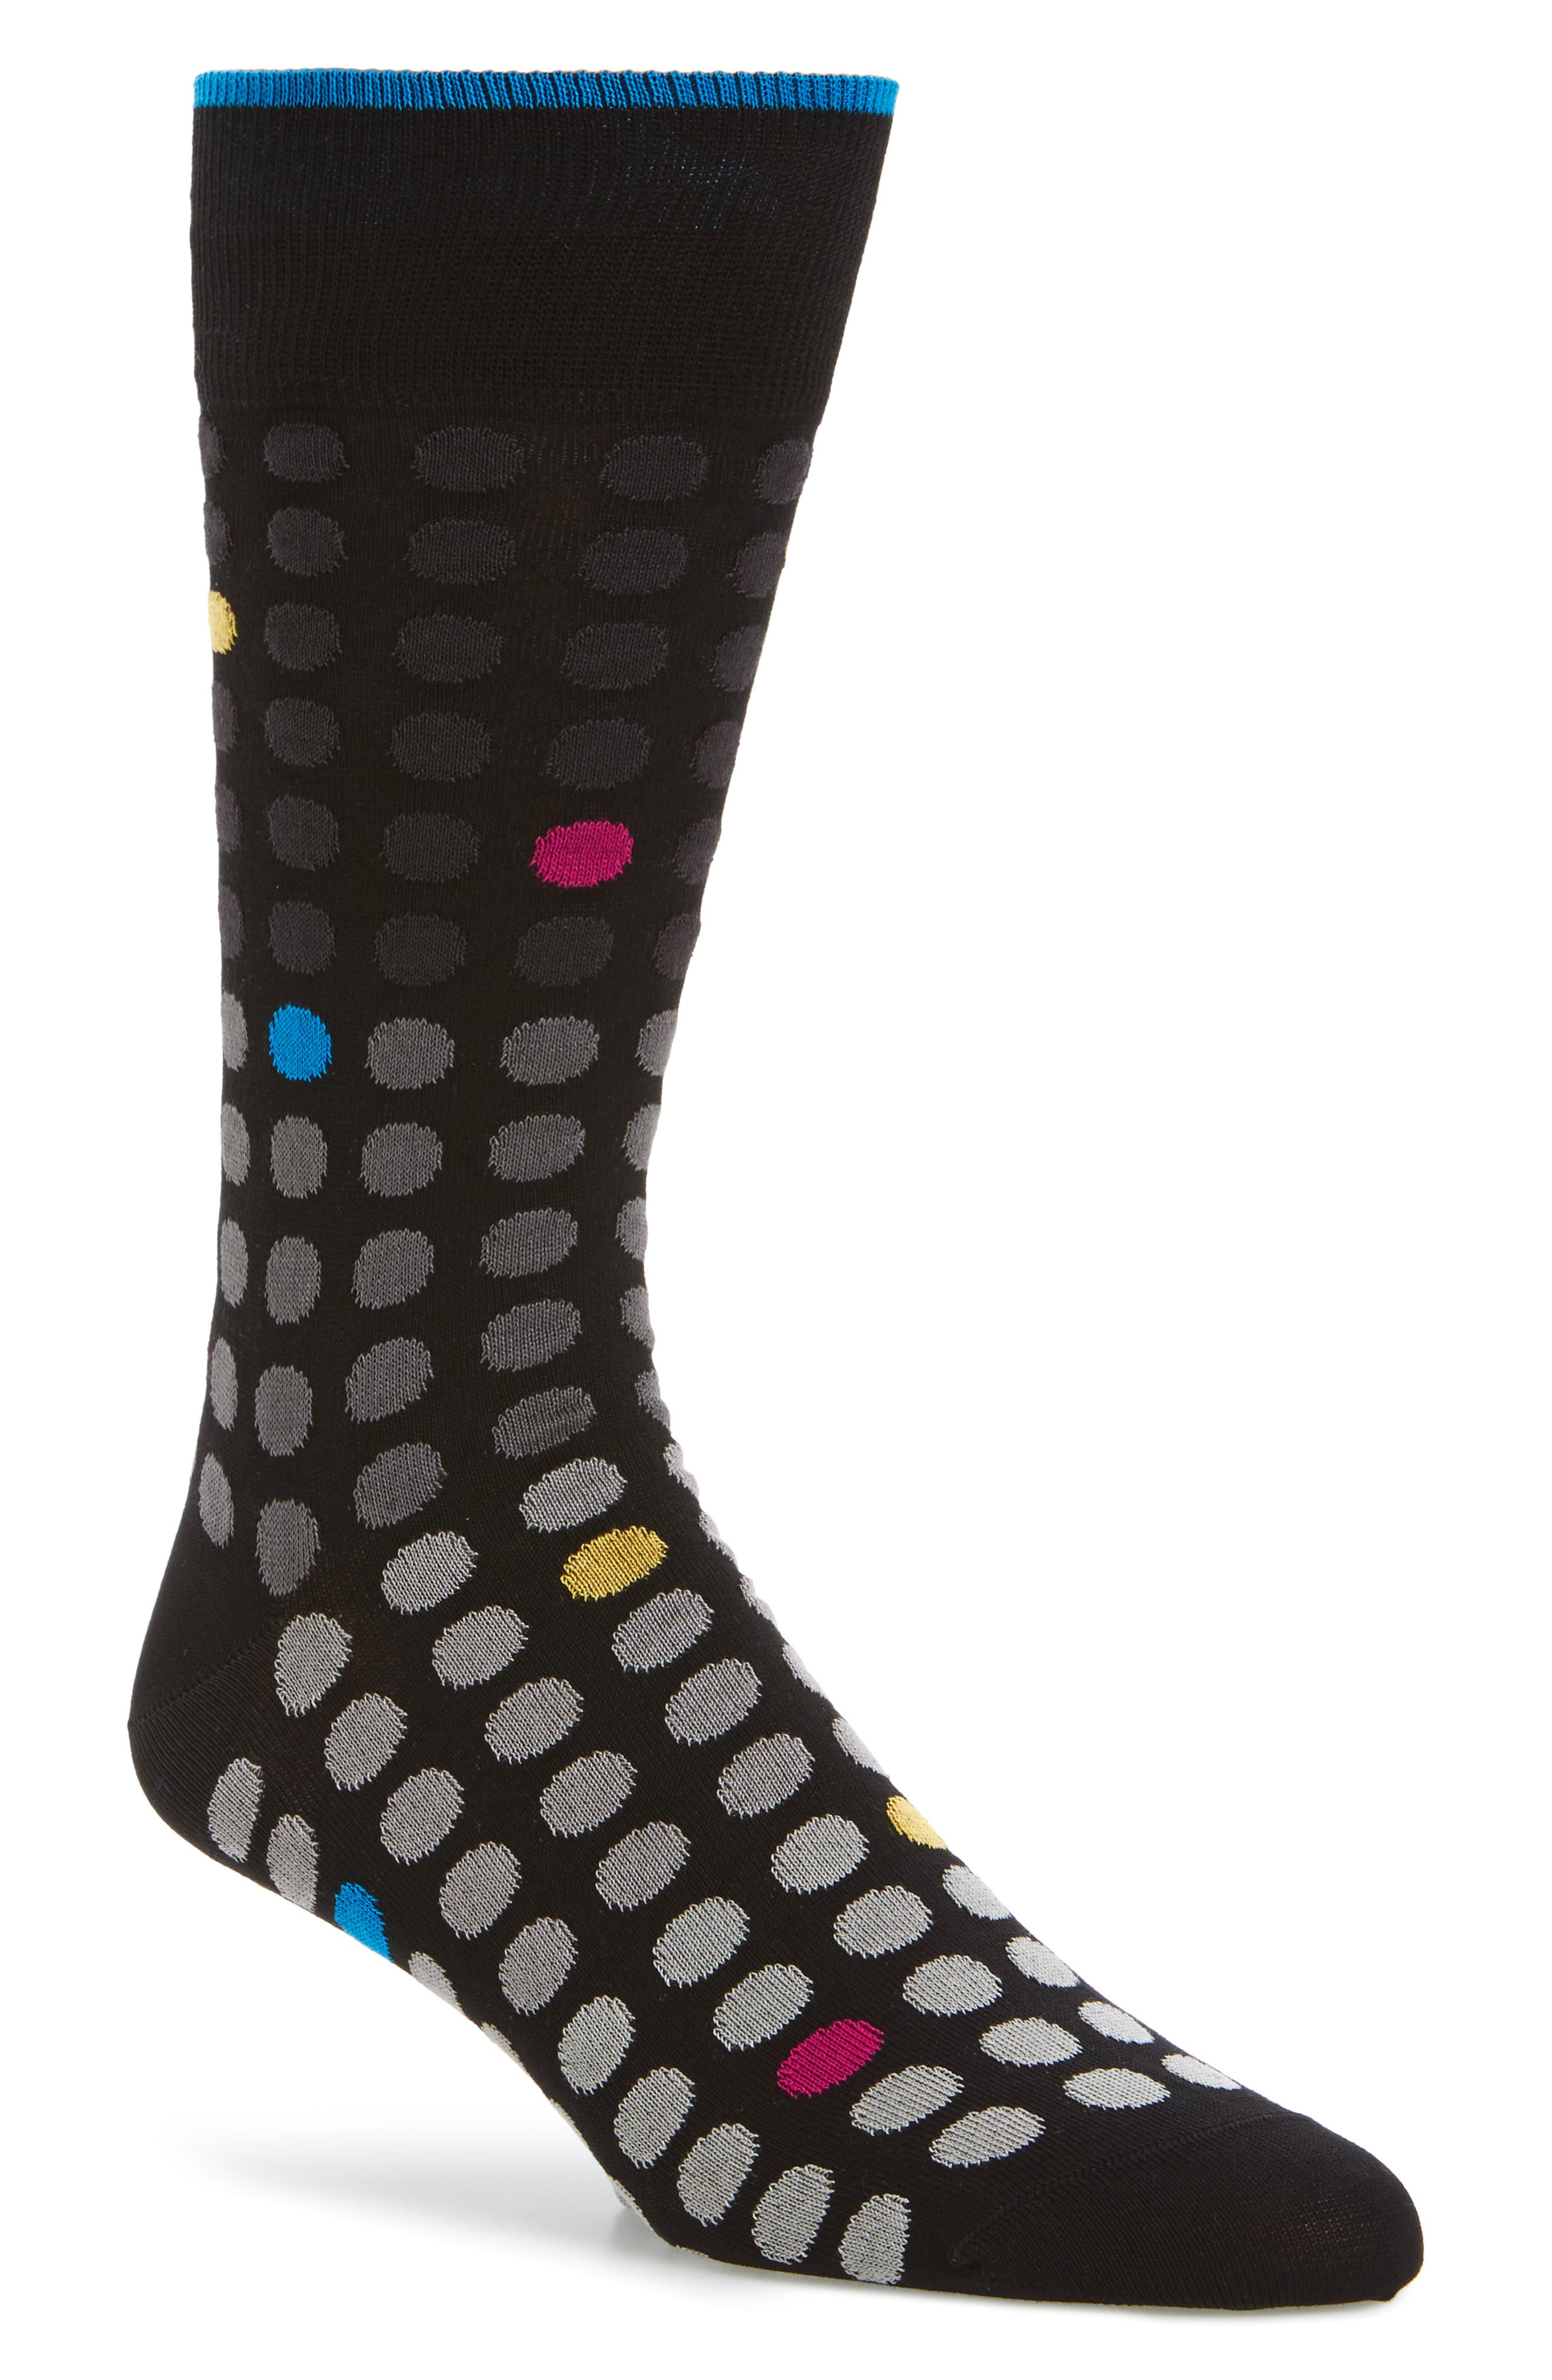 Alternate Image 1 Selected - Bugatchi Polka Dot Crew Socks